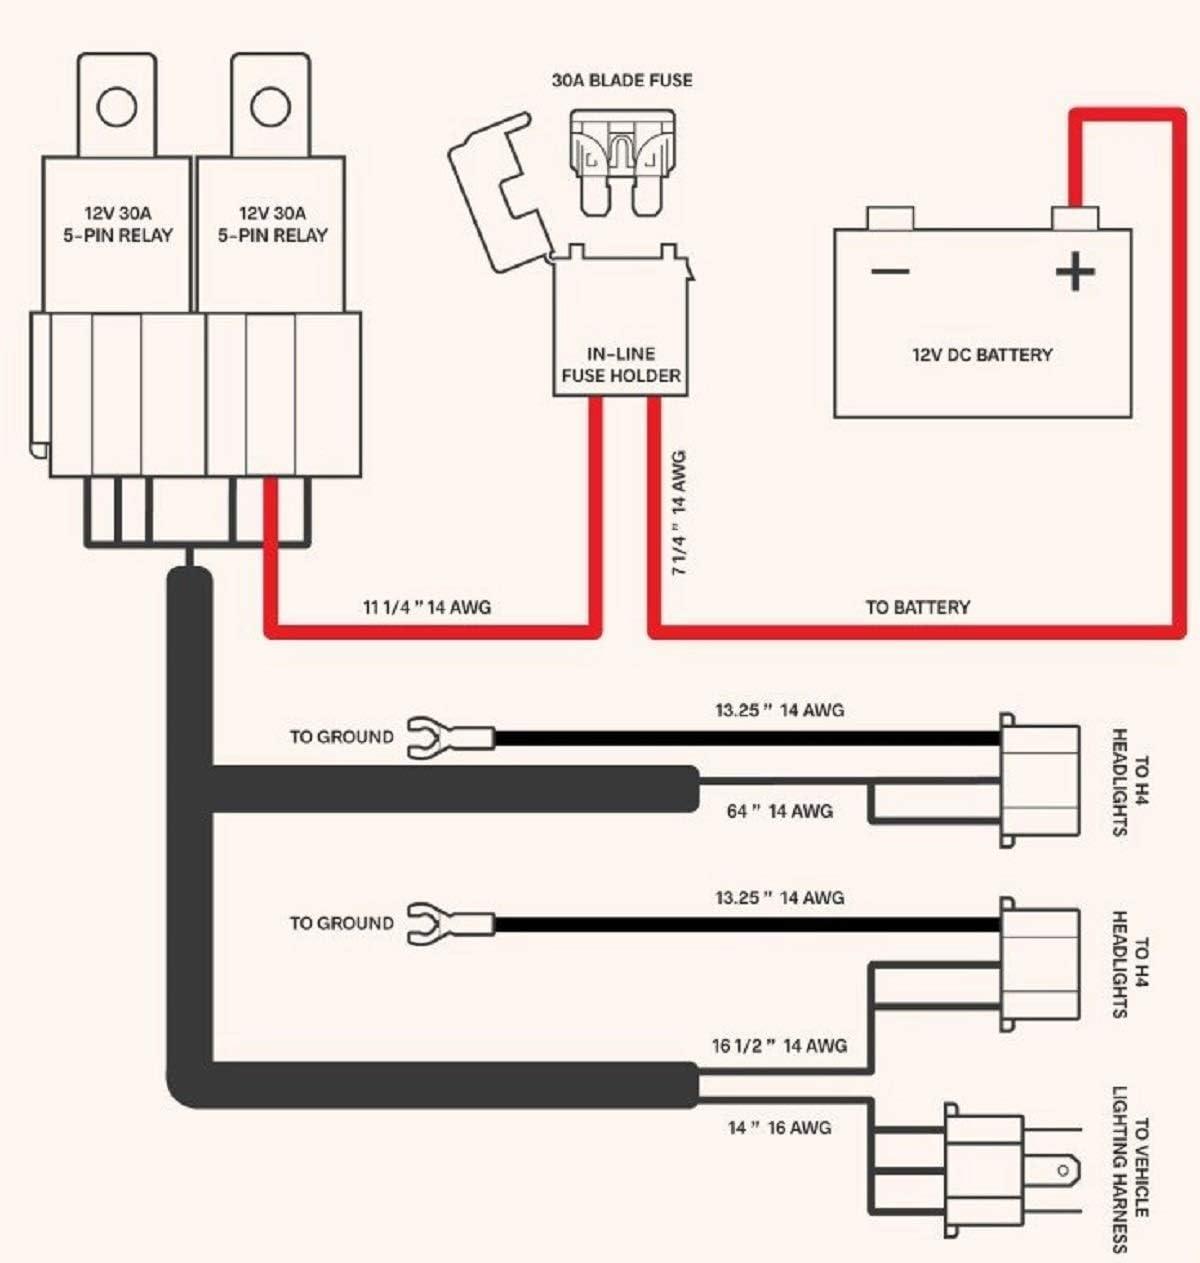 Amazon.com: OCTANE LIGHTING Ceramic H4 Headlight Relay Wiring Harness 2  Headlamp Light Bulb Socket Plugs 7X6: AutomotiveAmazon.com